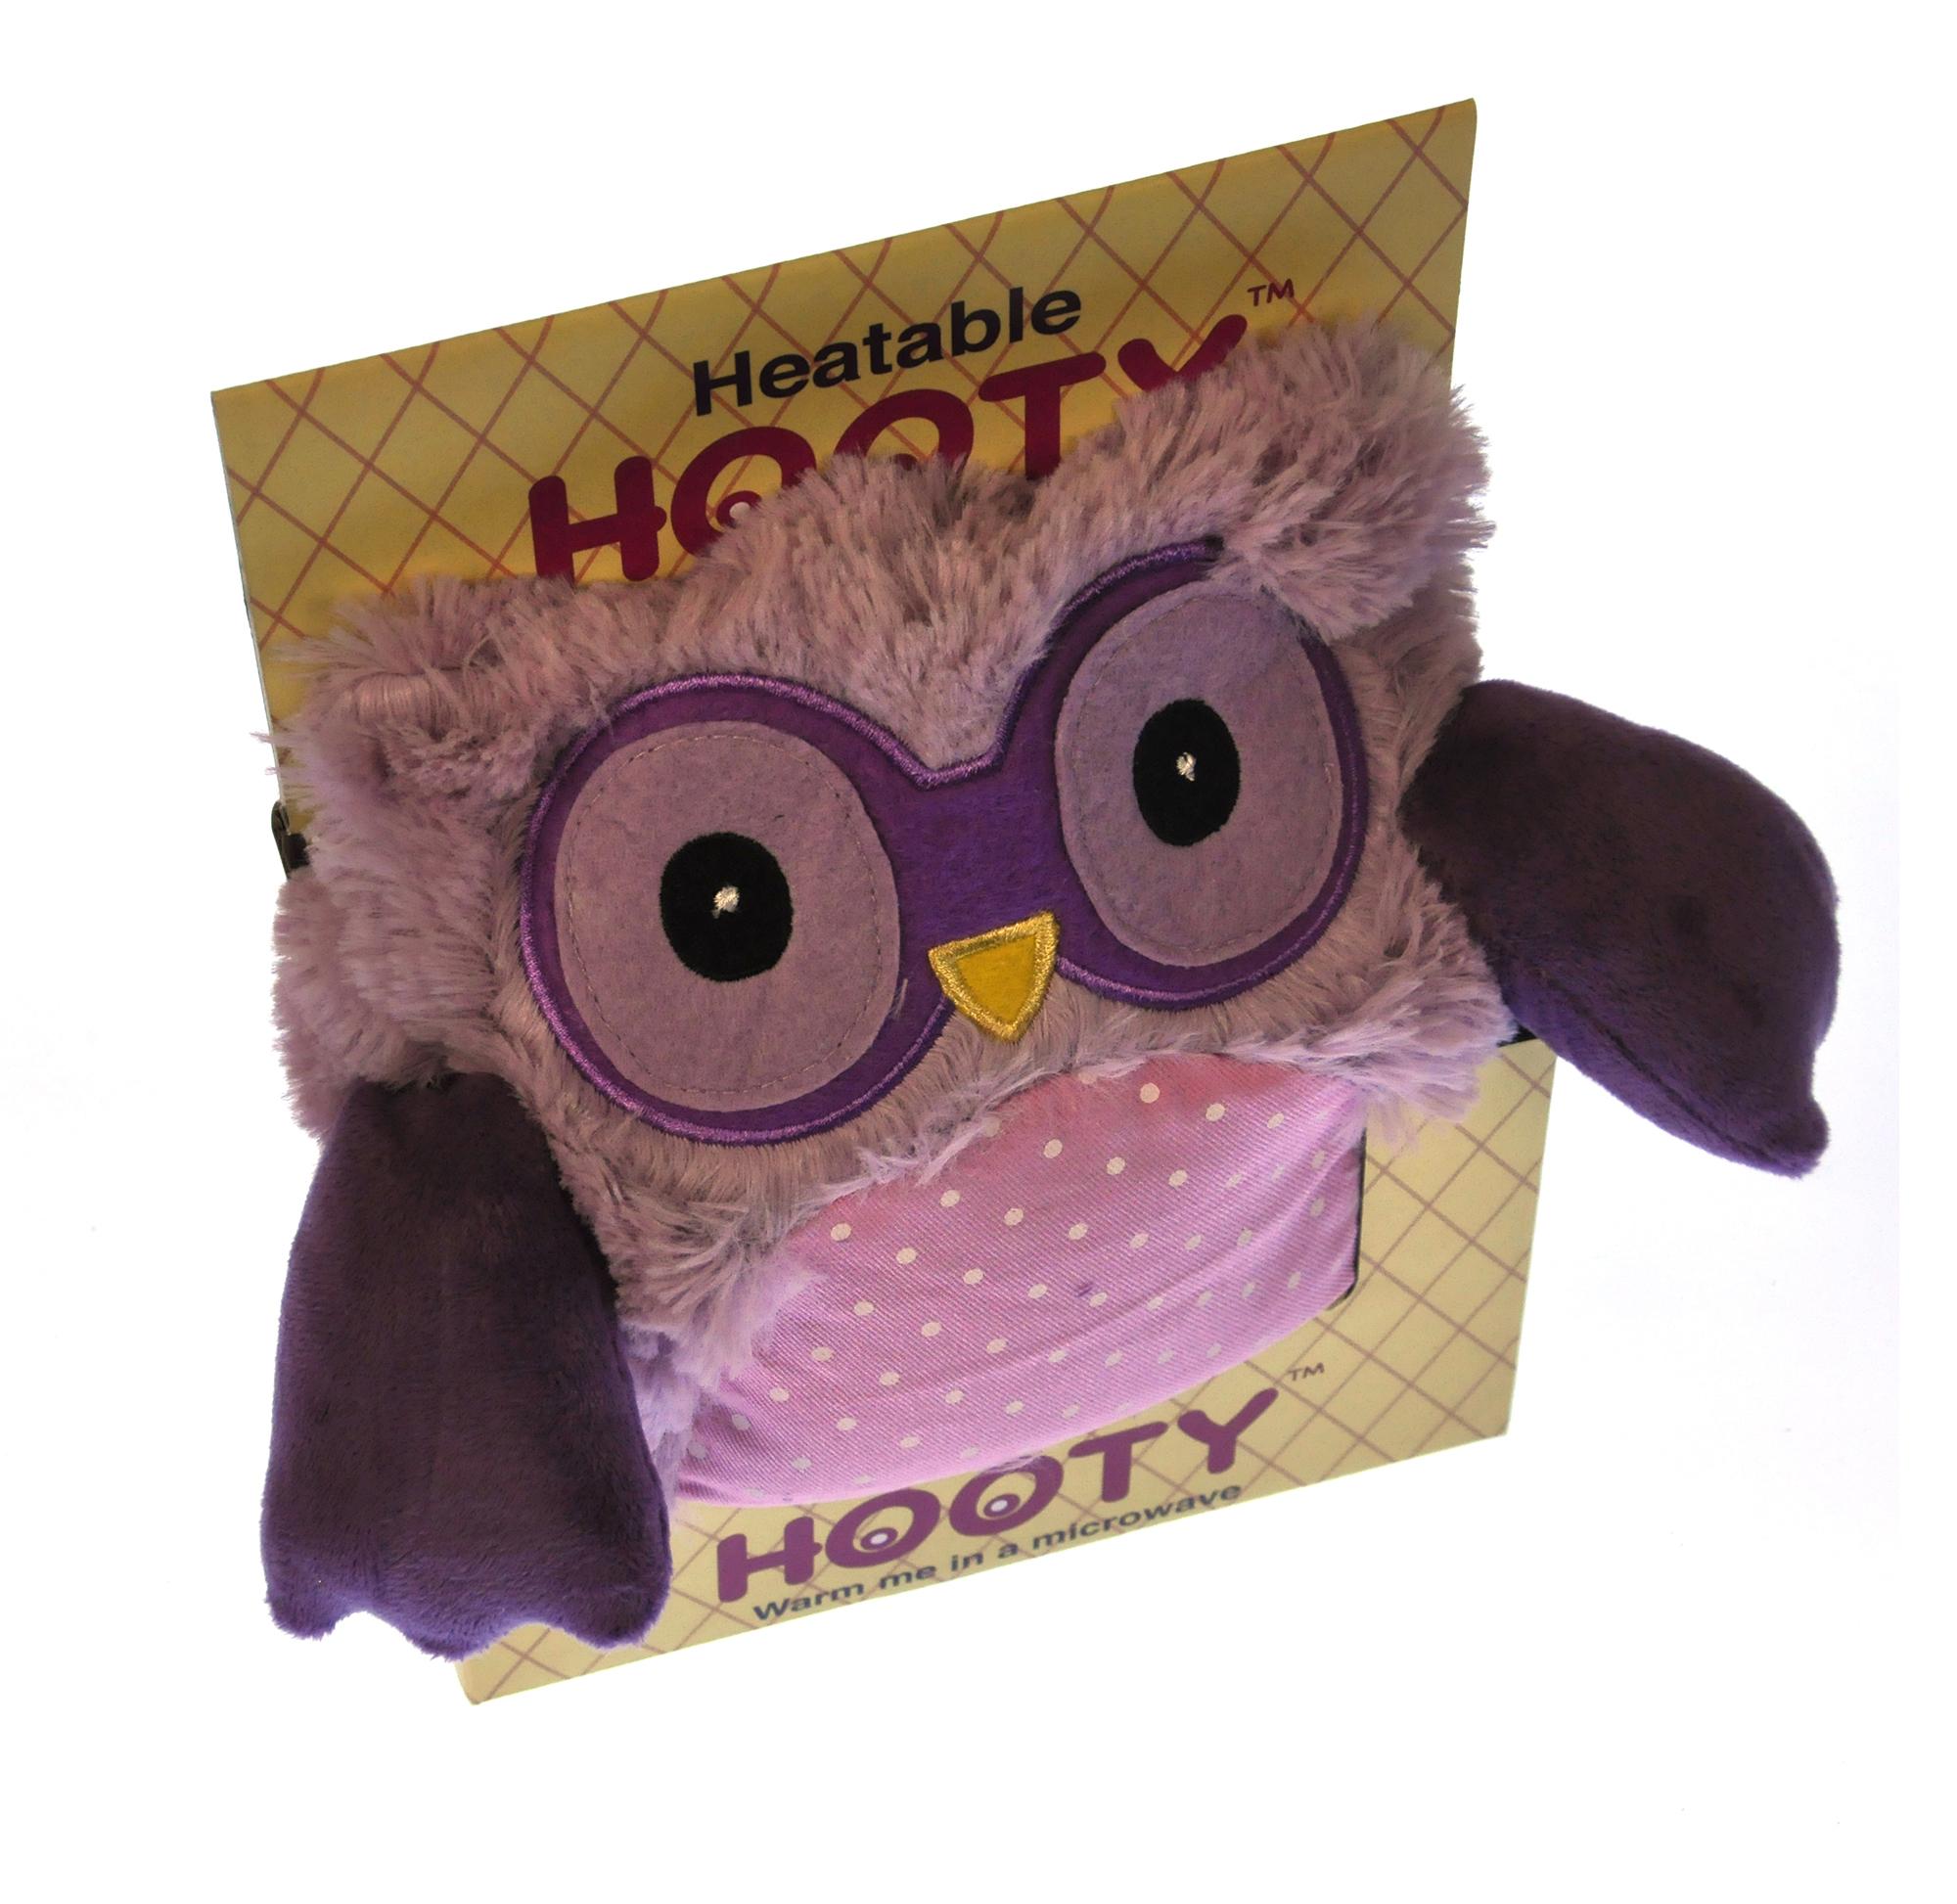 Purple Heatable Hooty